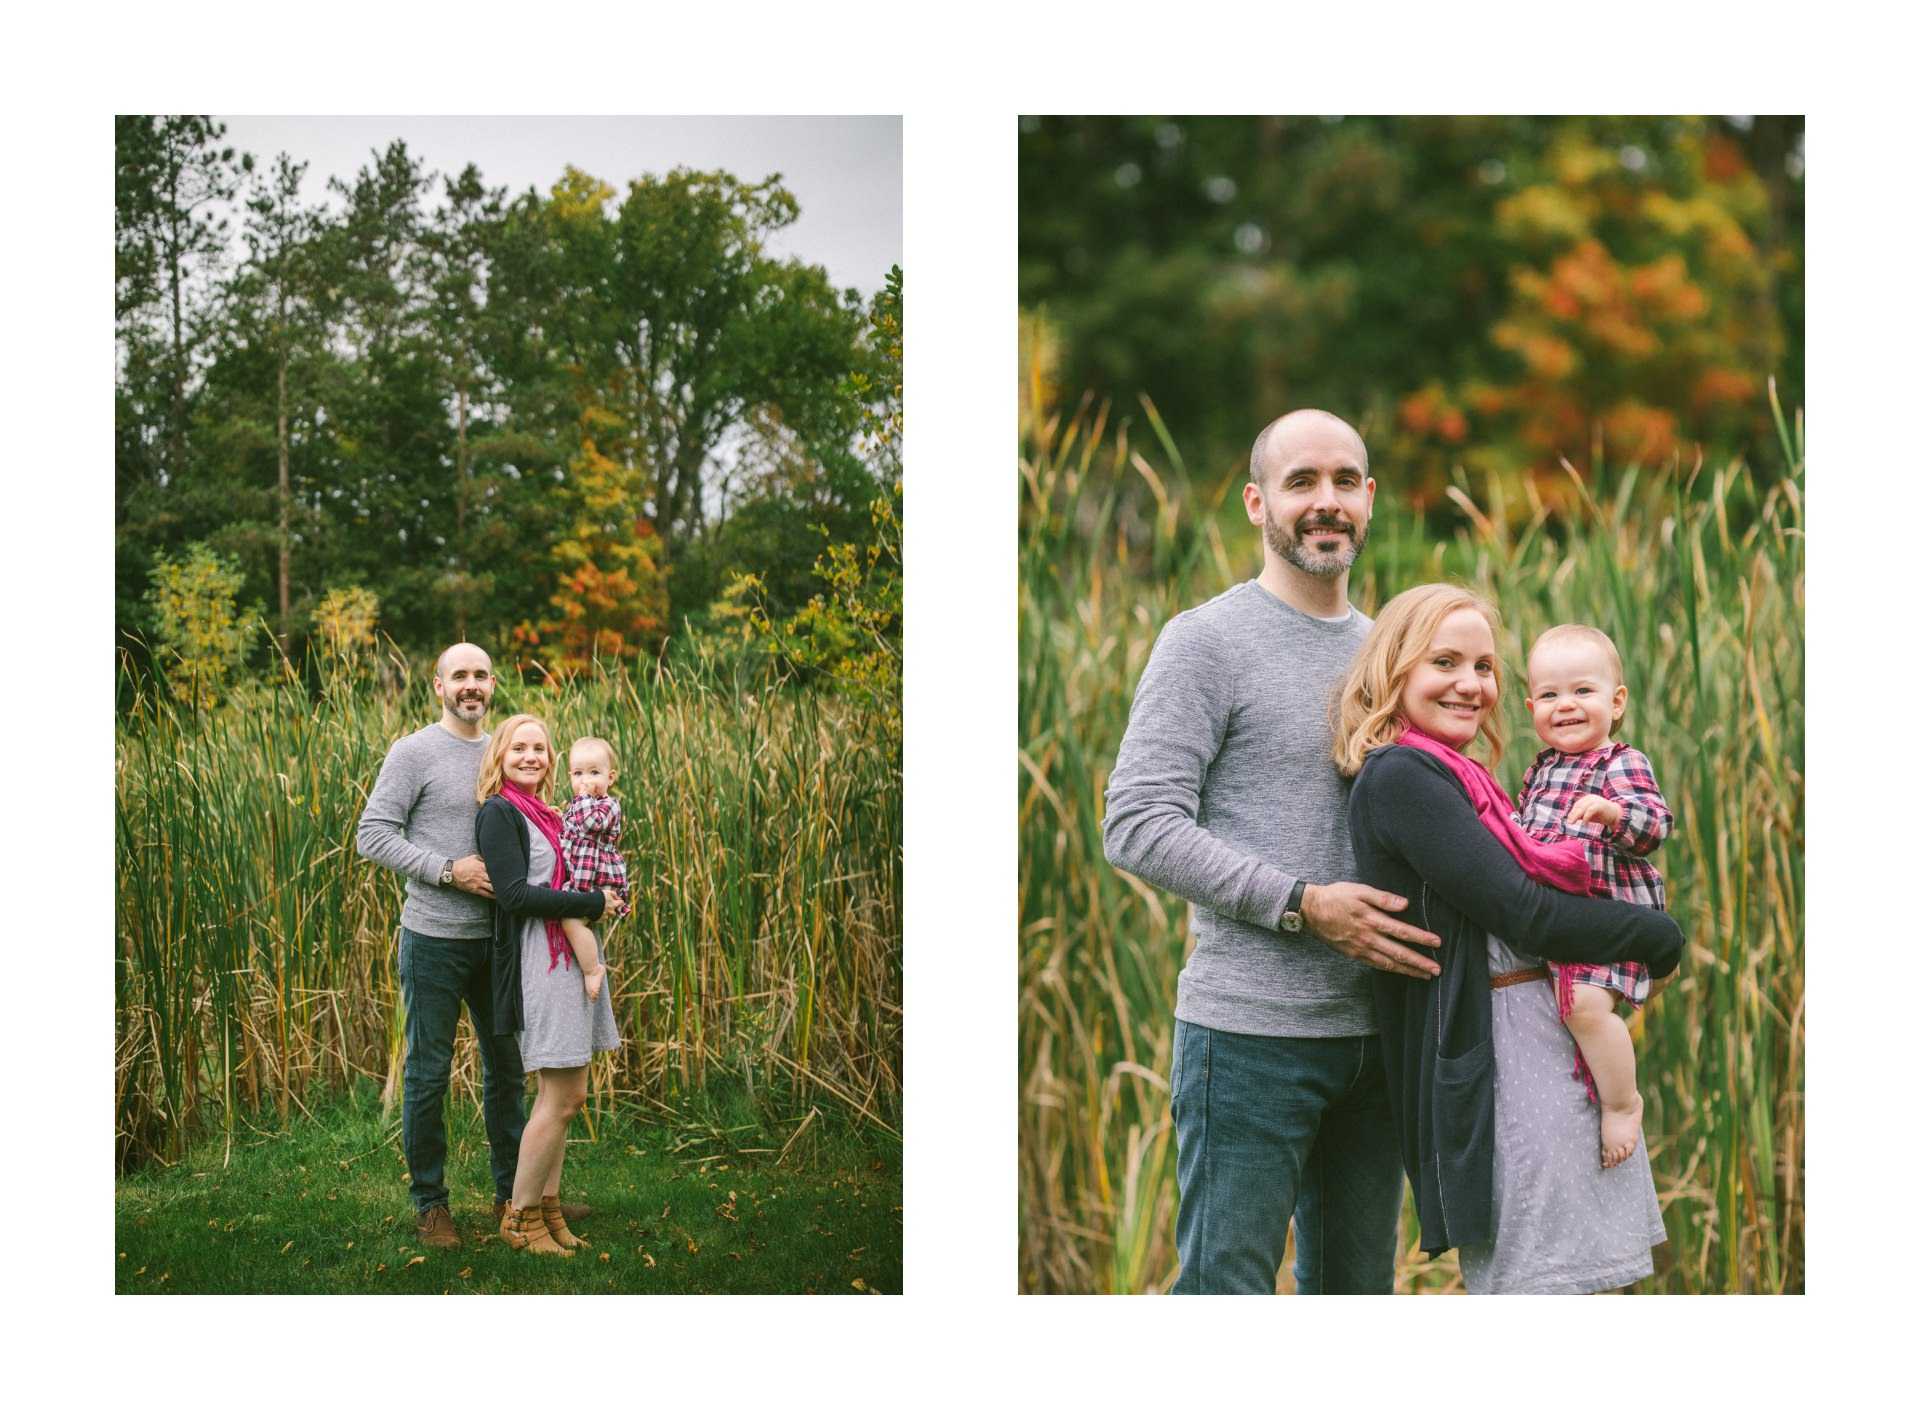 Lakewood Ohio Family Photographer 5.jpg